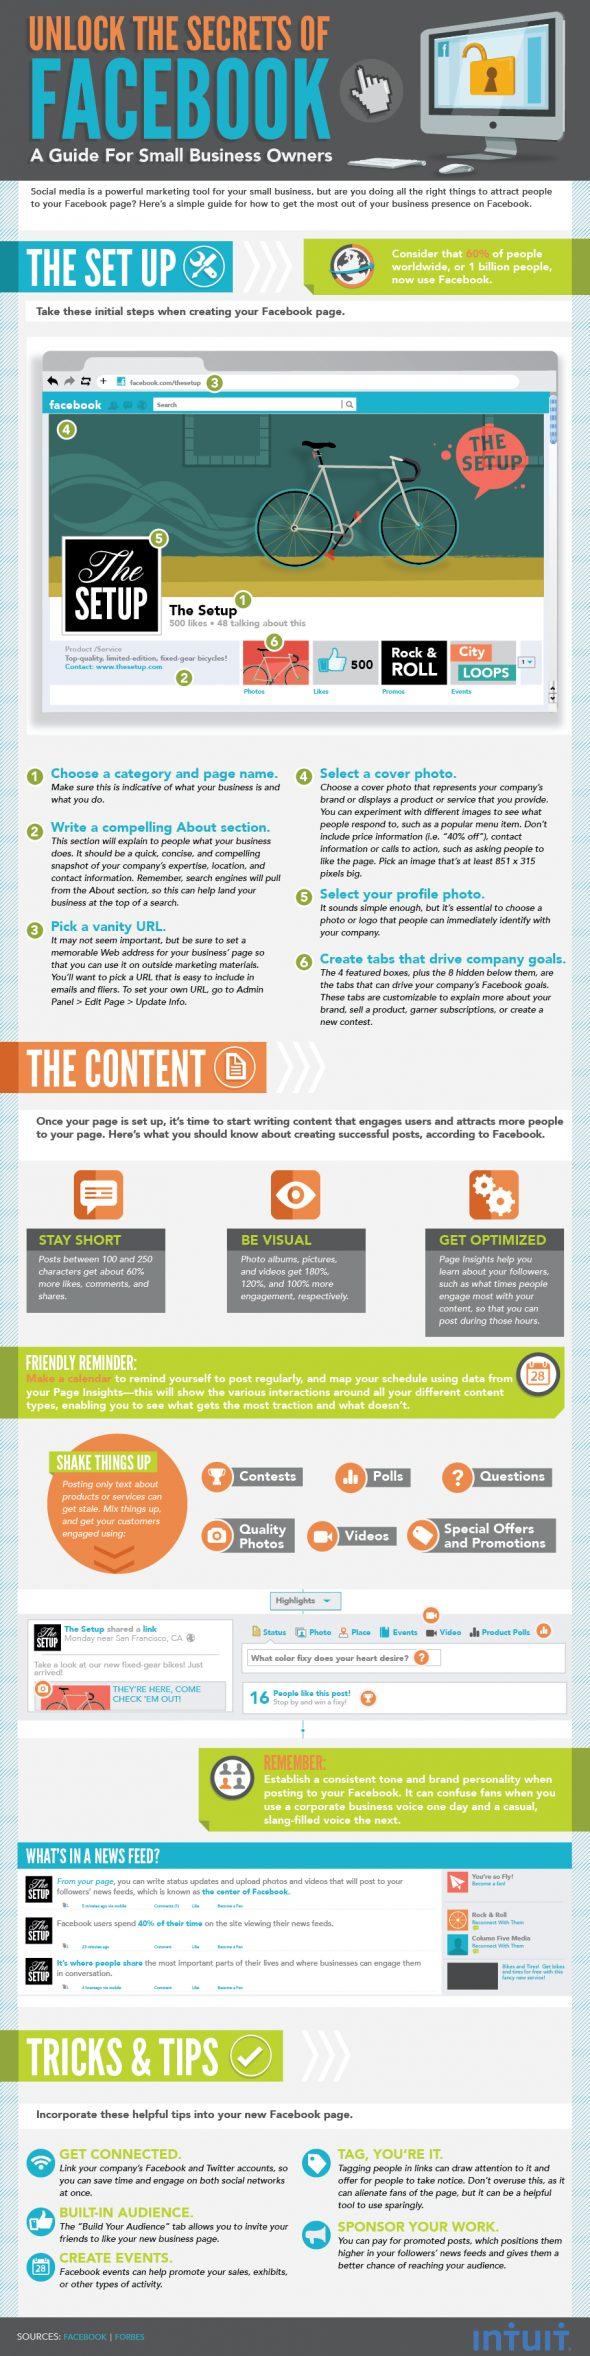 Intuit-FB-marketing-tips-590x2356